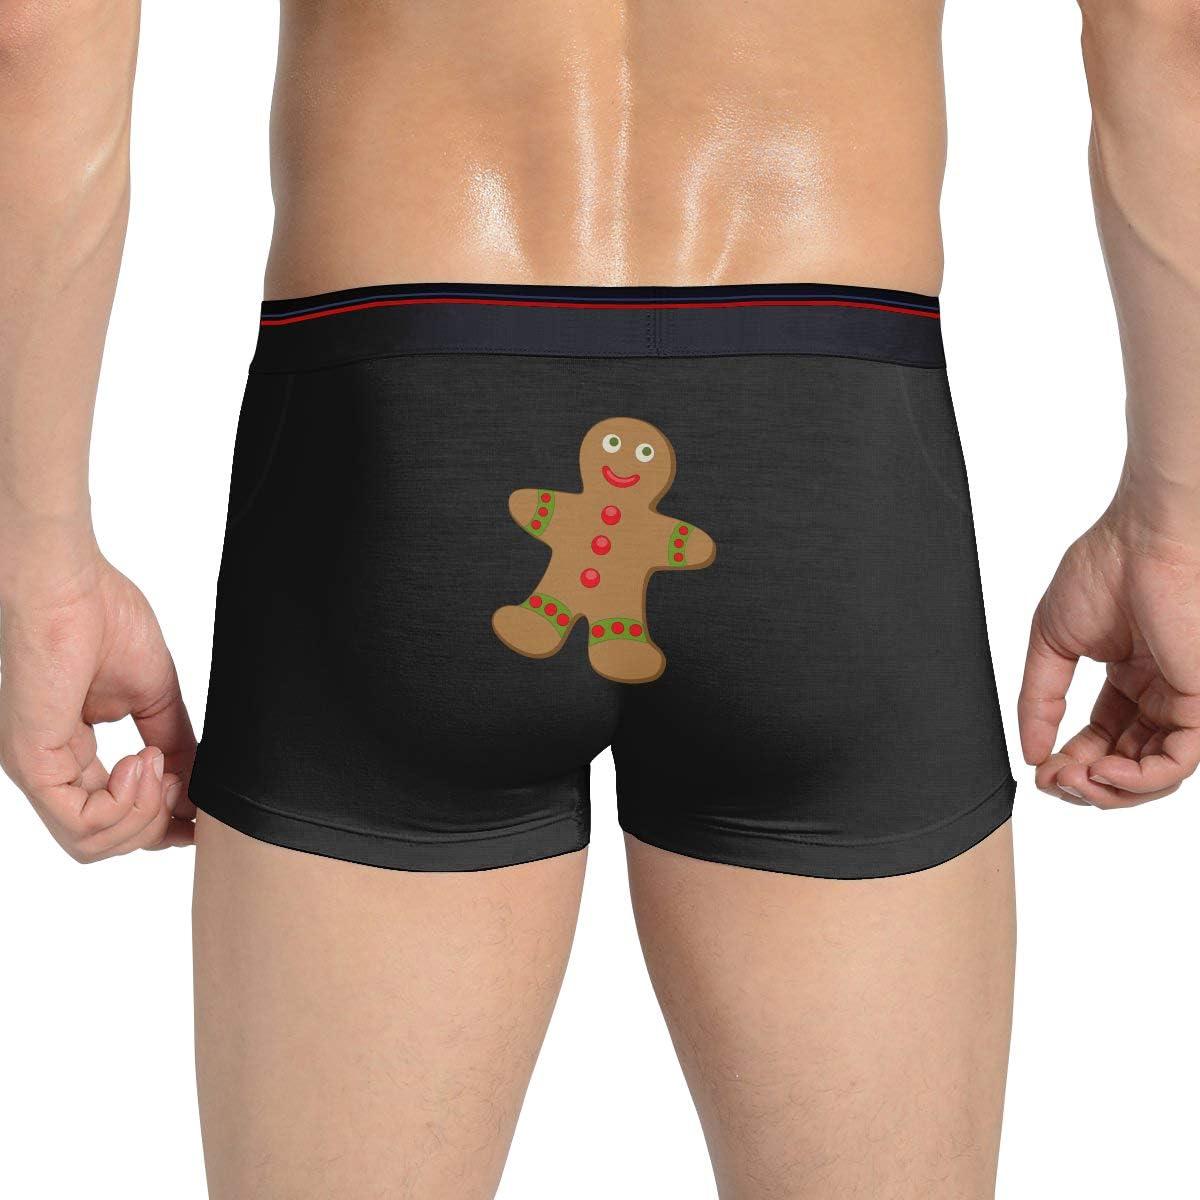 Mens Underwear Christmas Gingerbread Cotton Custom Boxer Brief FunnyBoy Briefs